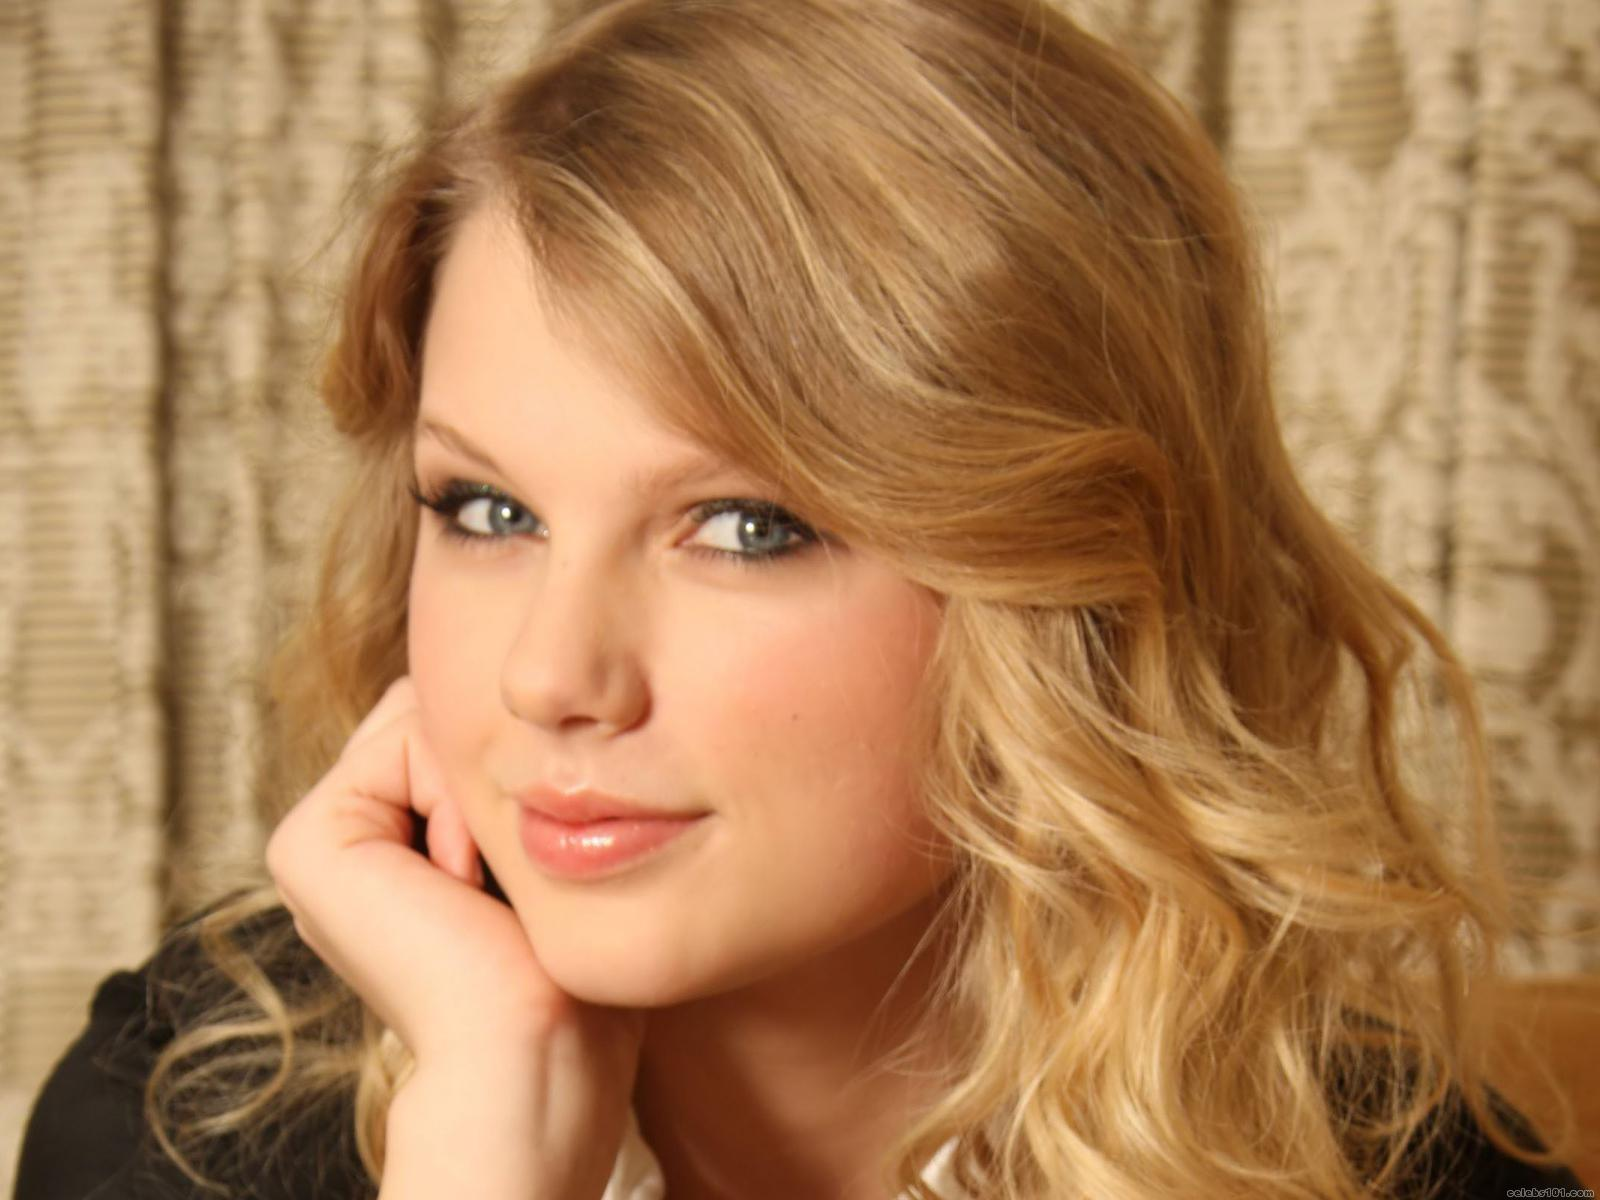 http://1.bp.blogspot.com/-lH5INAhWKr8/Tg8qKjXpeNI/AAAAAAAAKjk/QQokGF0qTXk/s1600/Taylor_Swift_10.jpg